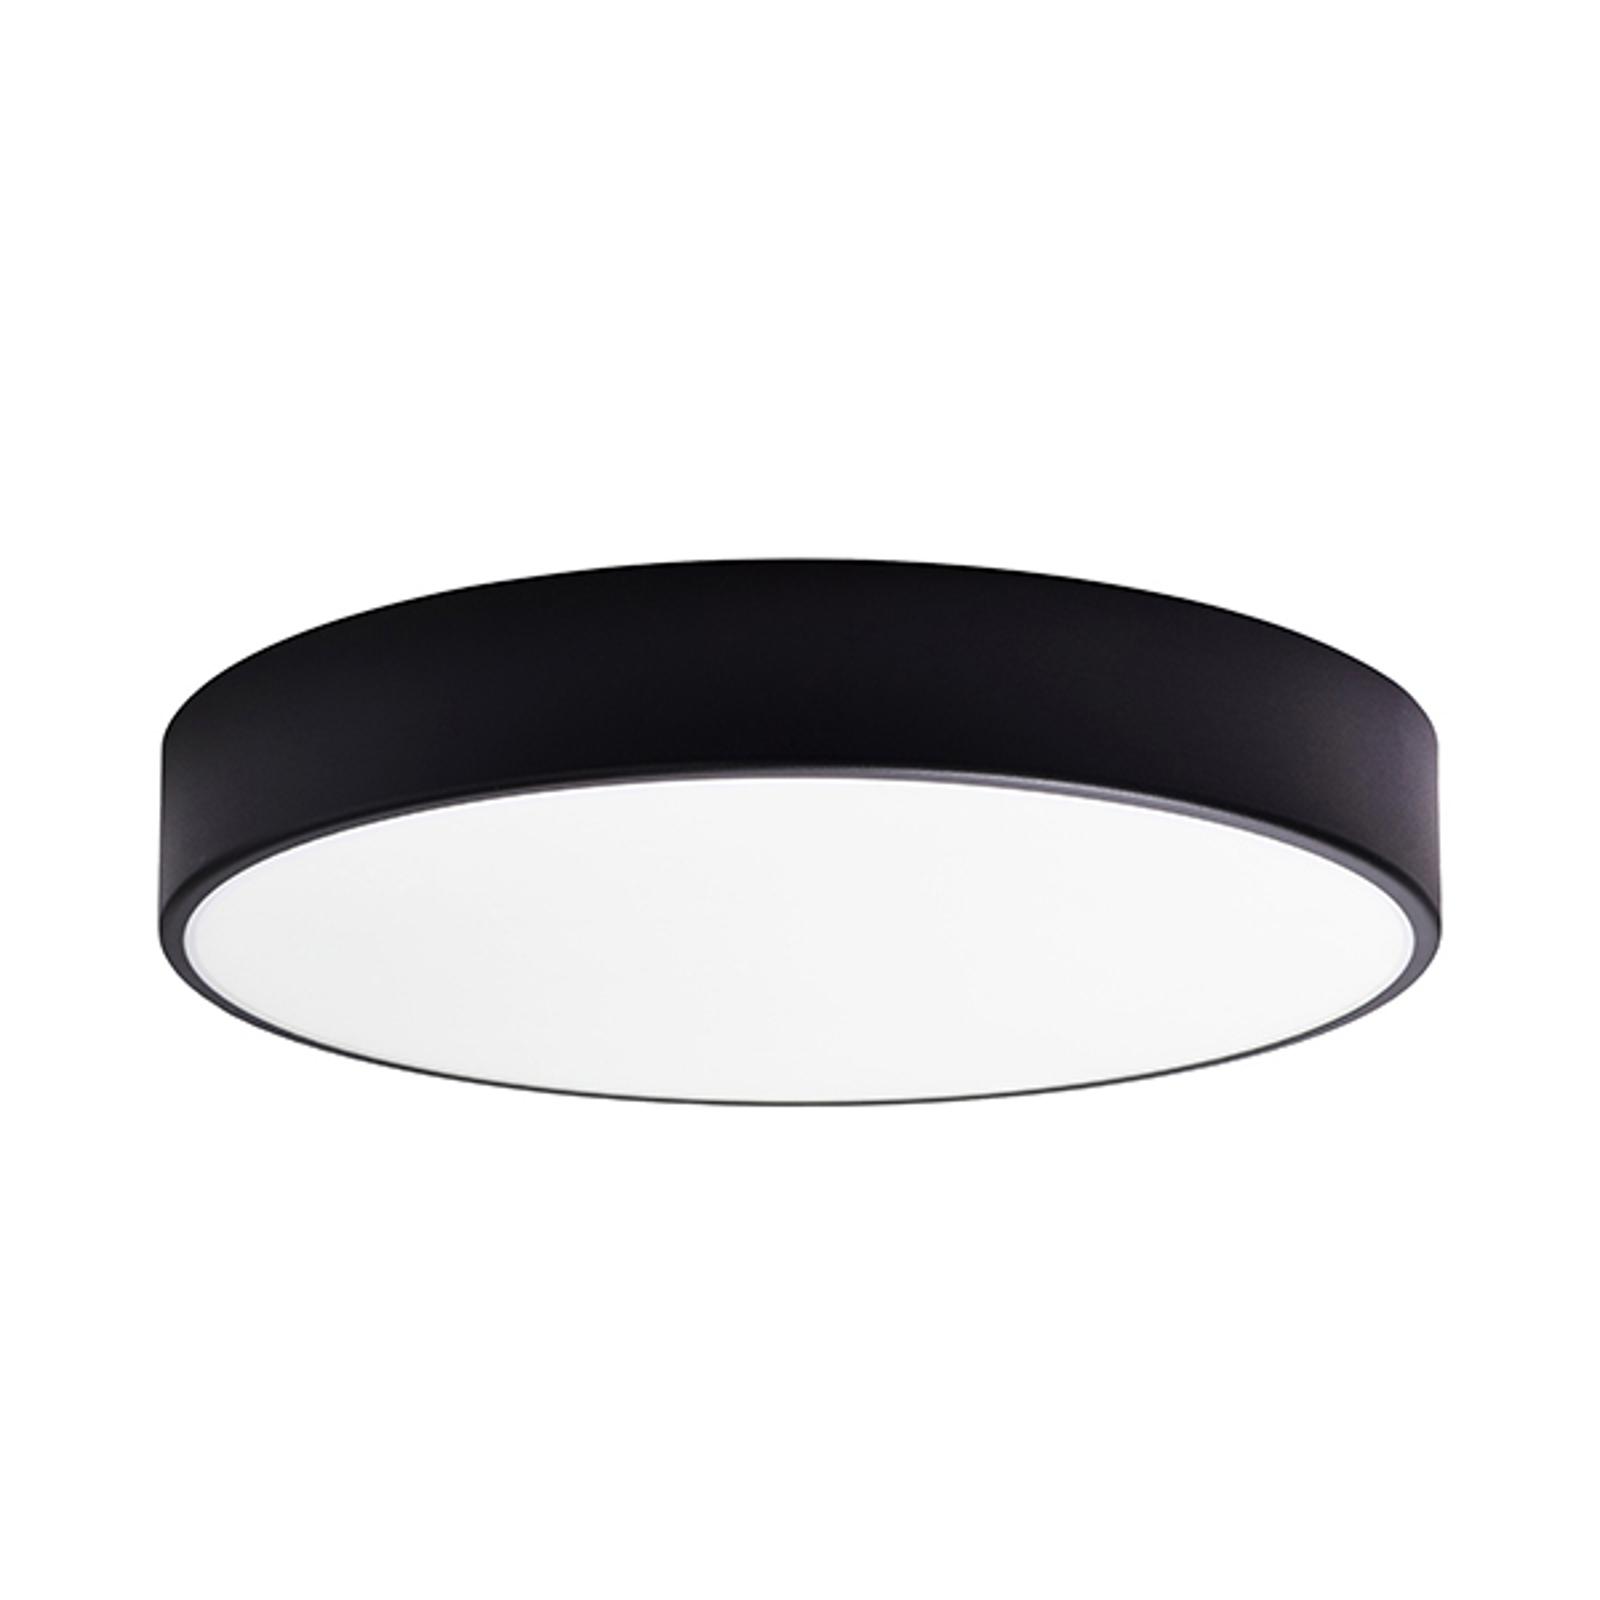 Cleo loftlampe, Ø 50 cm, sort